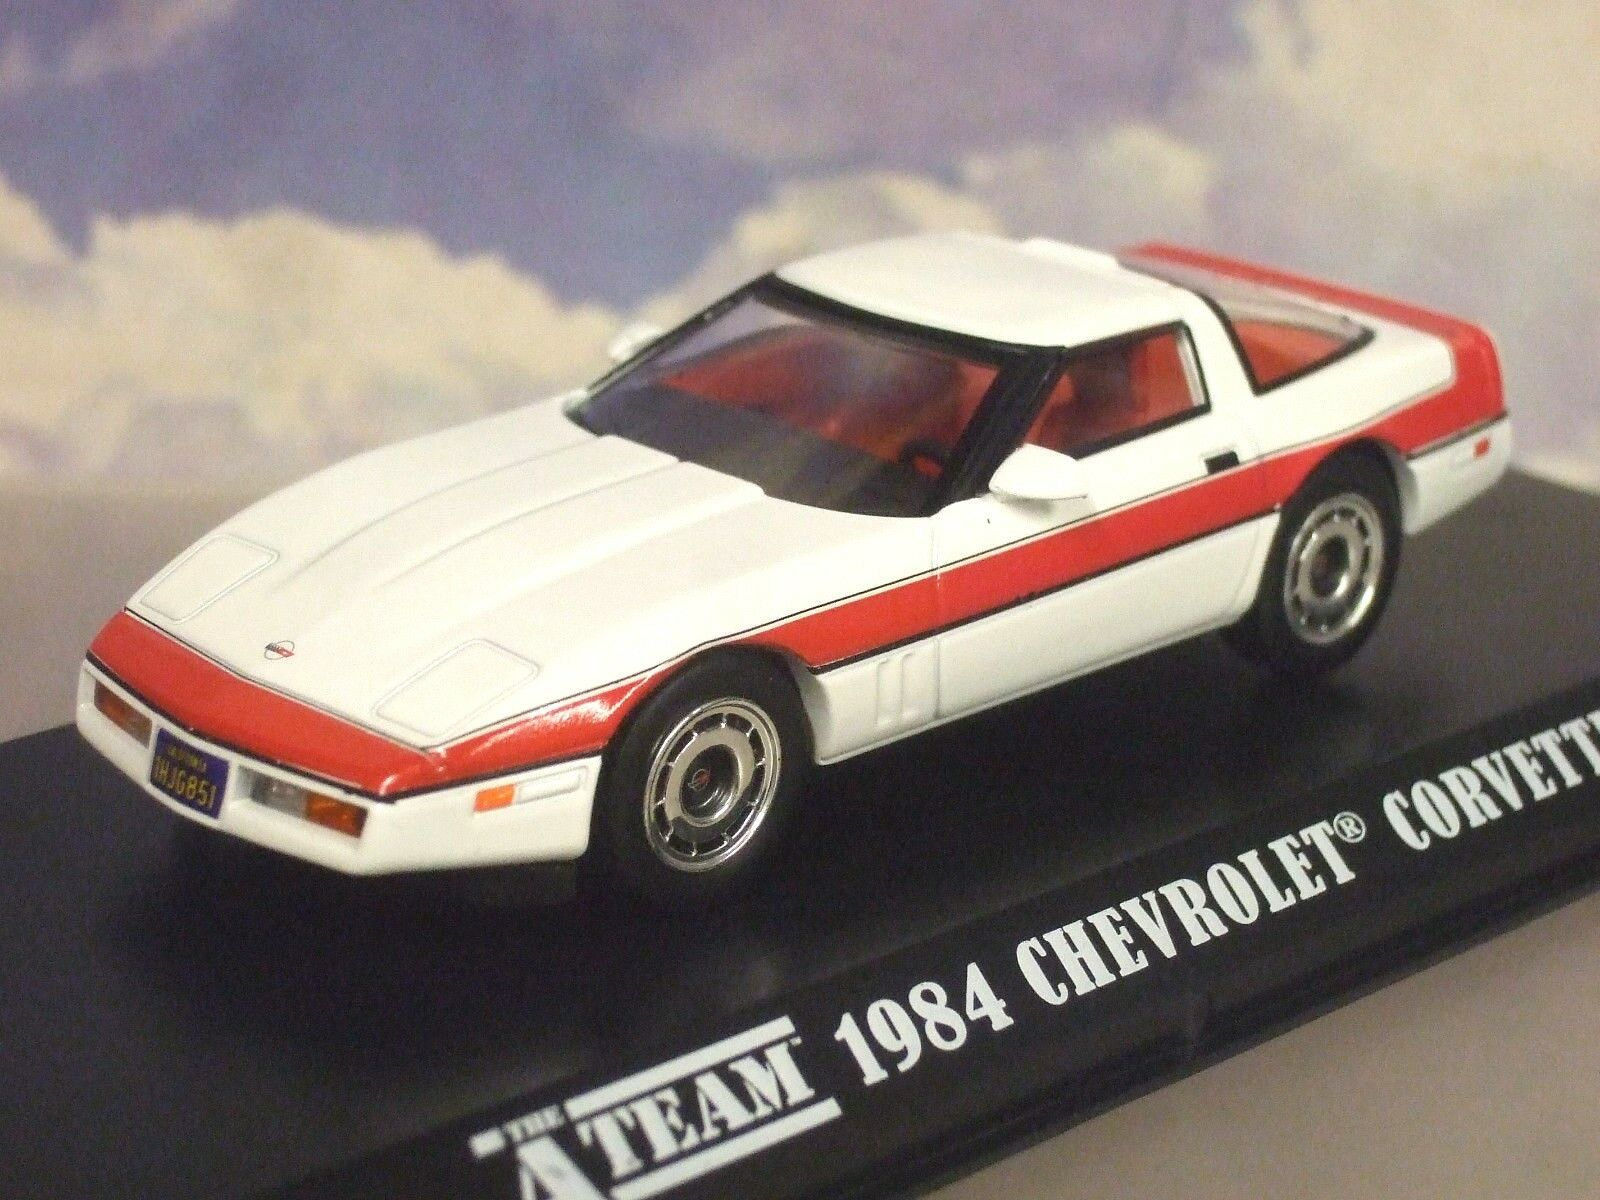 vertlight 1 43 Face's 1984 Chevrolet Chevy Corvette C4 Blanc Rouge   The A-Team